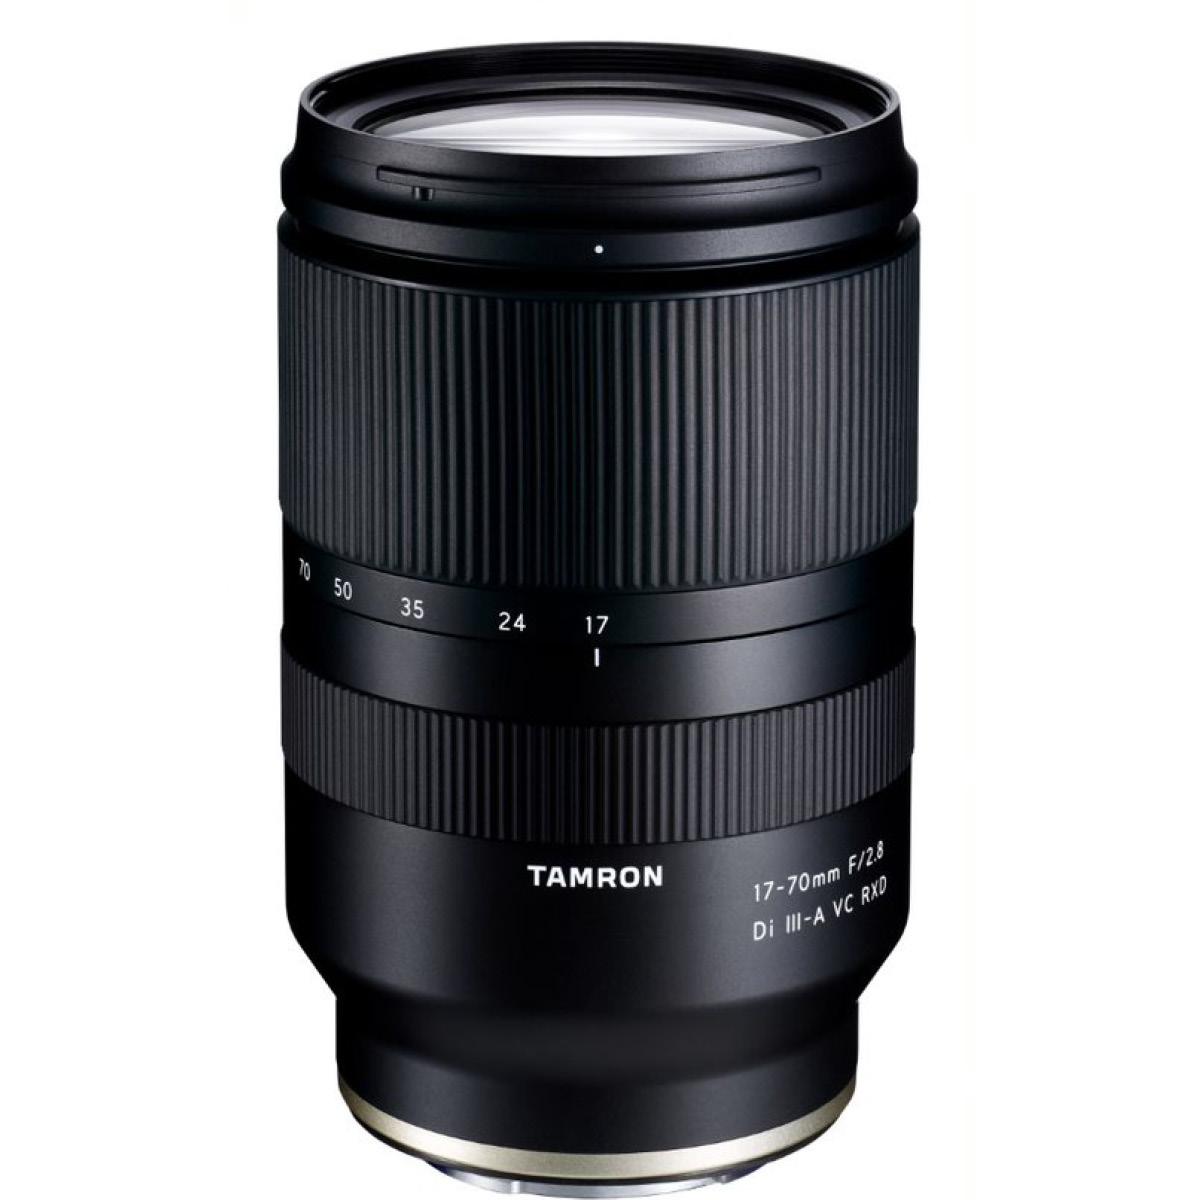 Tamron 17-70 mm 1:2,8 DI III-A VC RXD E-Mount